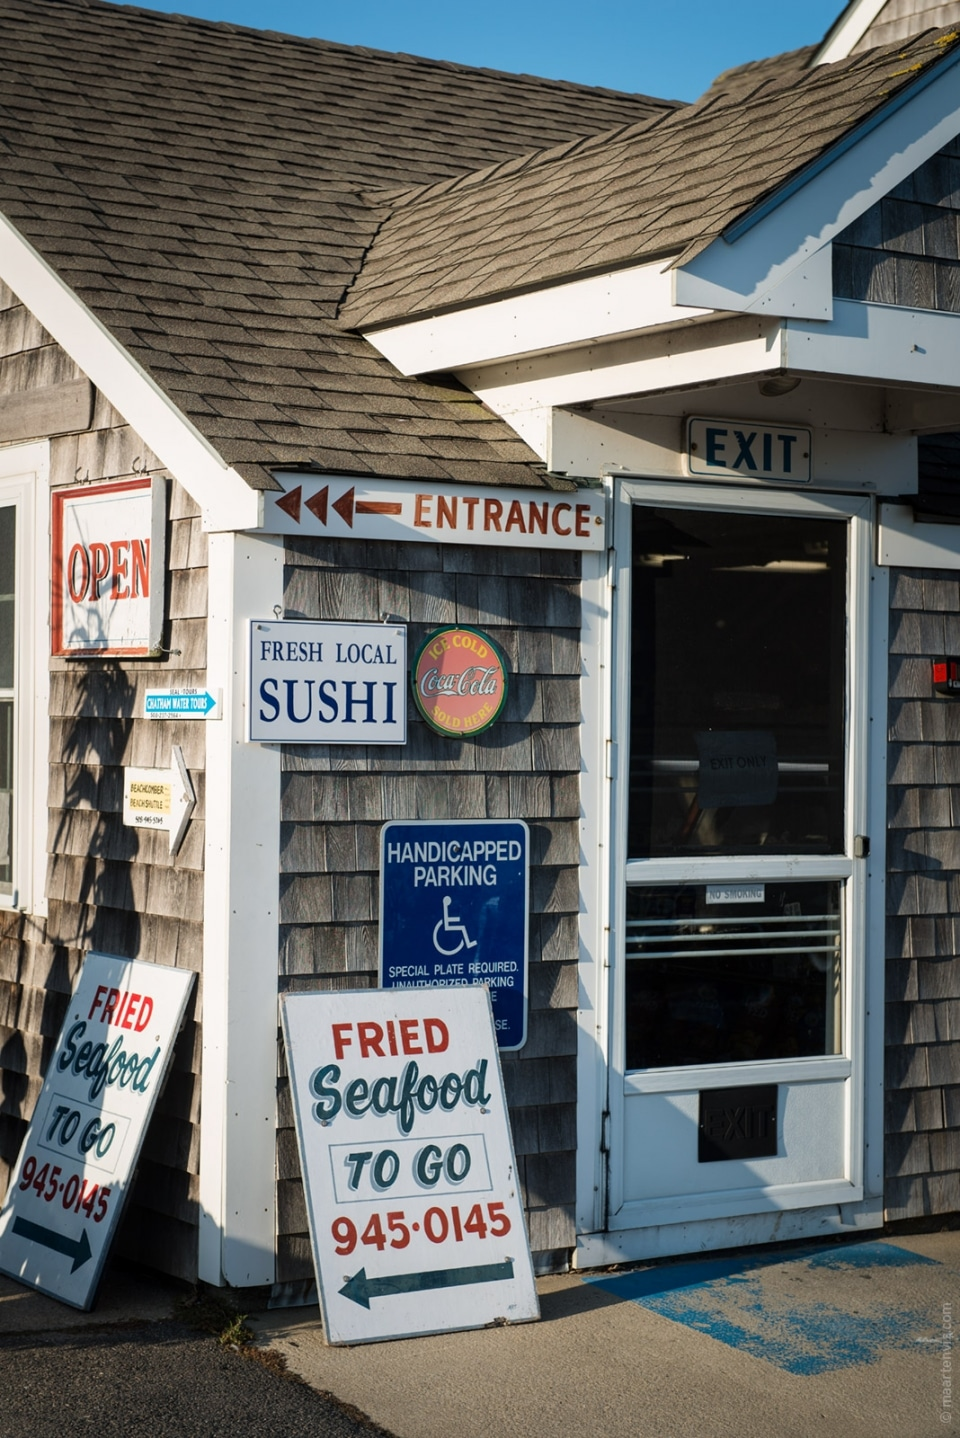 20131016 4557 960x1438 - Chatham Beach, Massachusetts